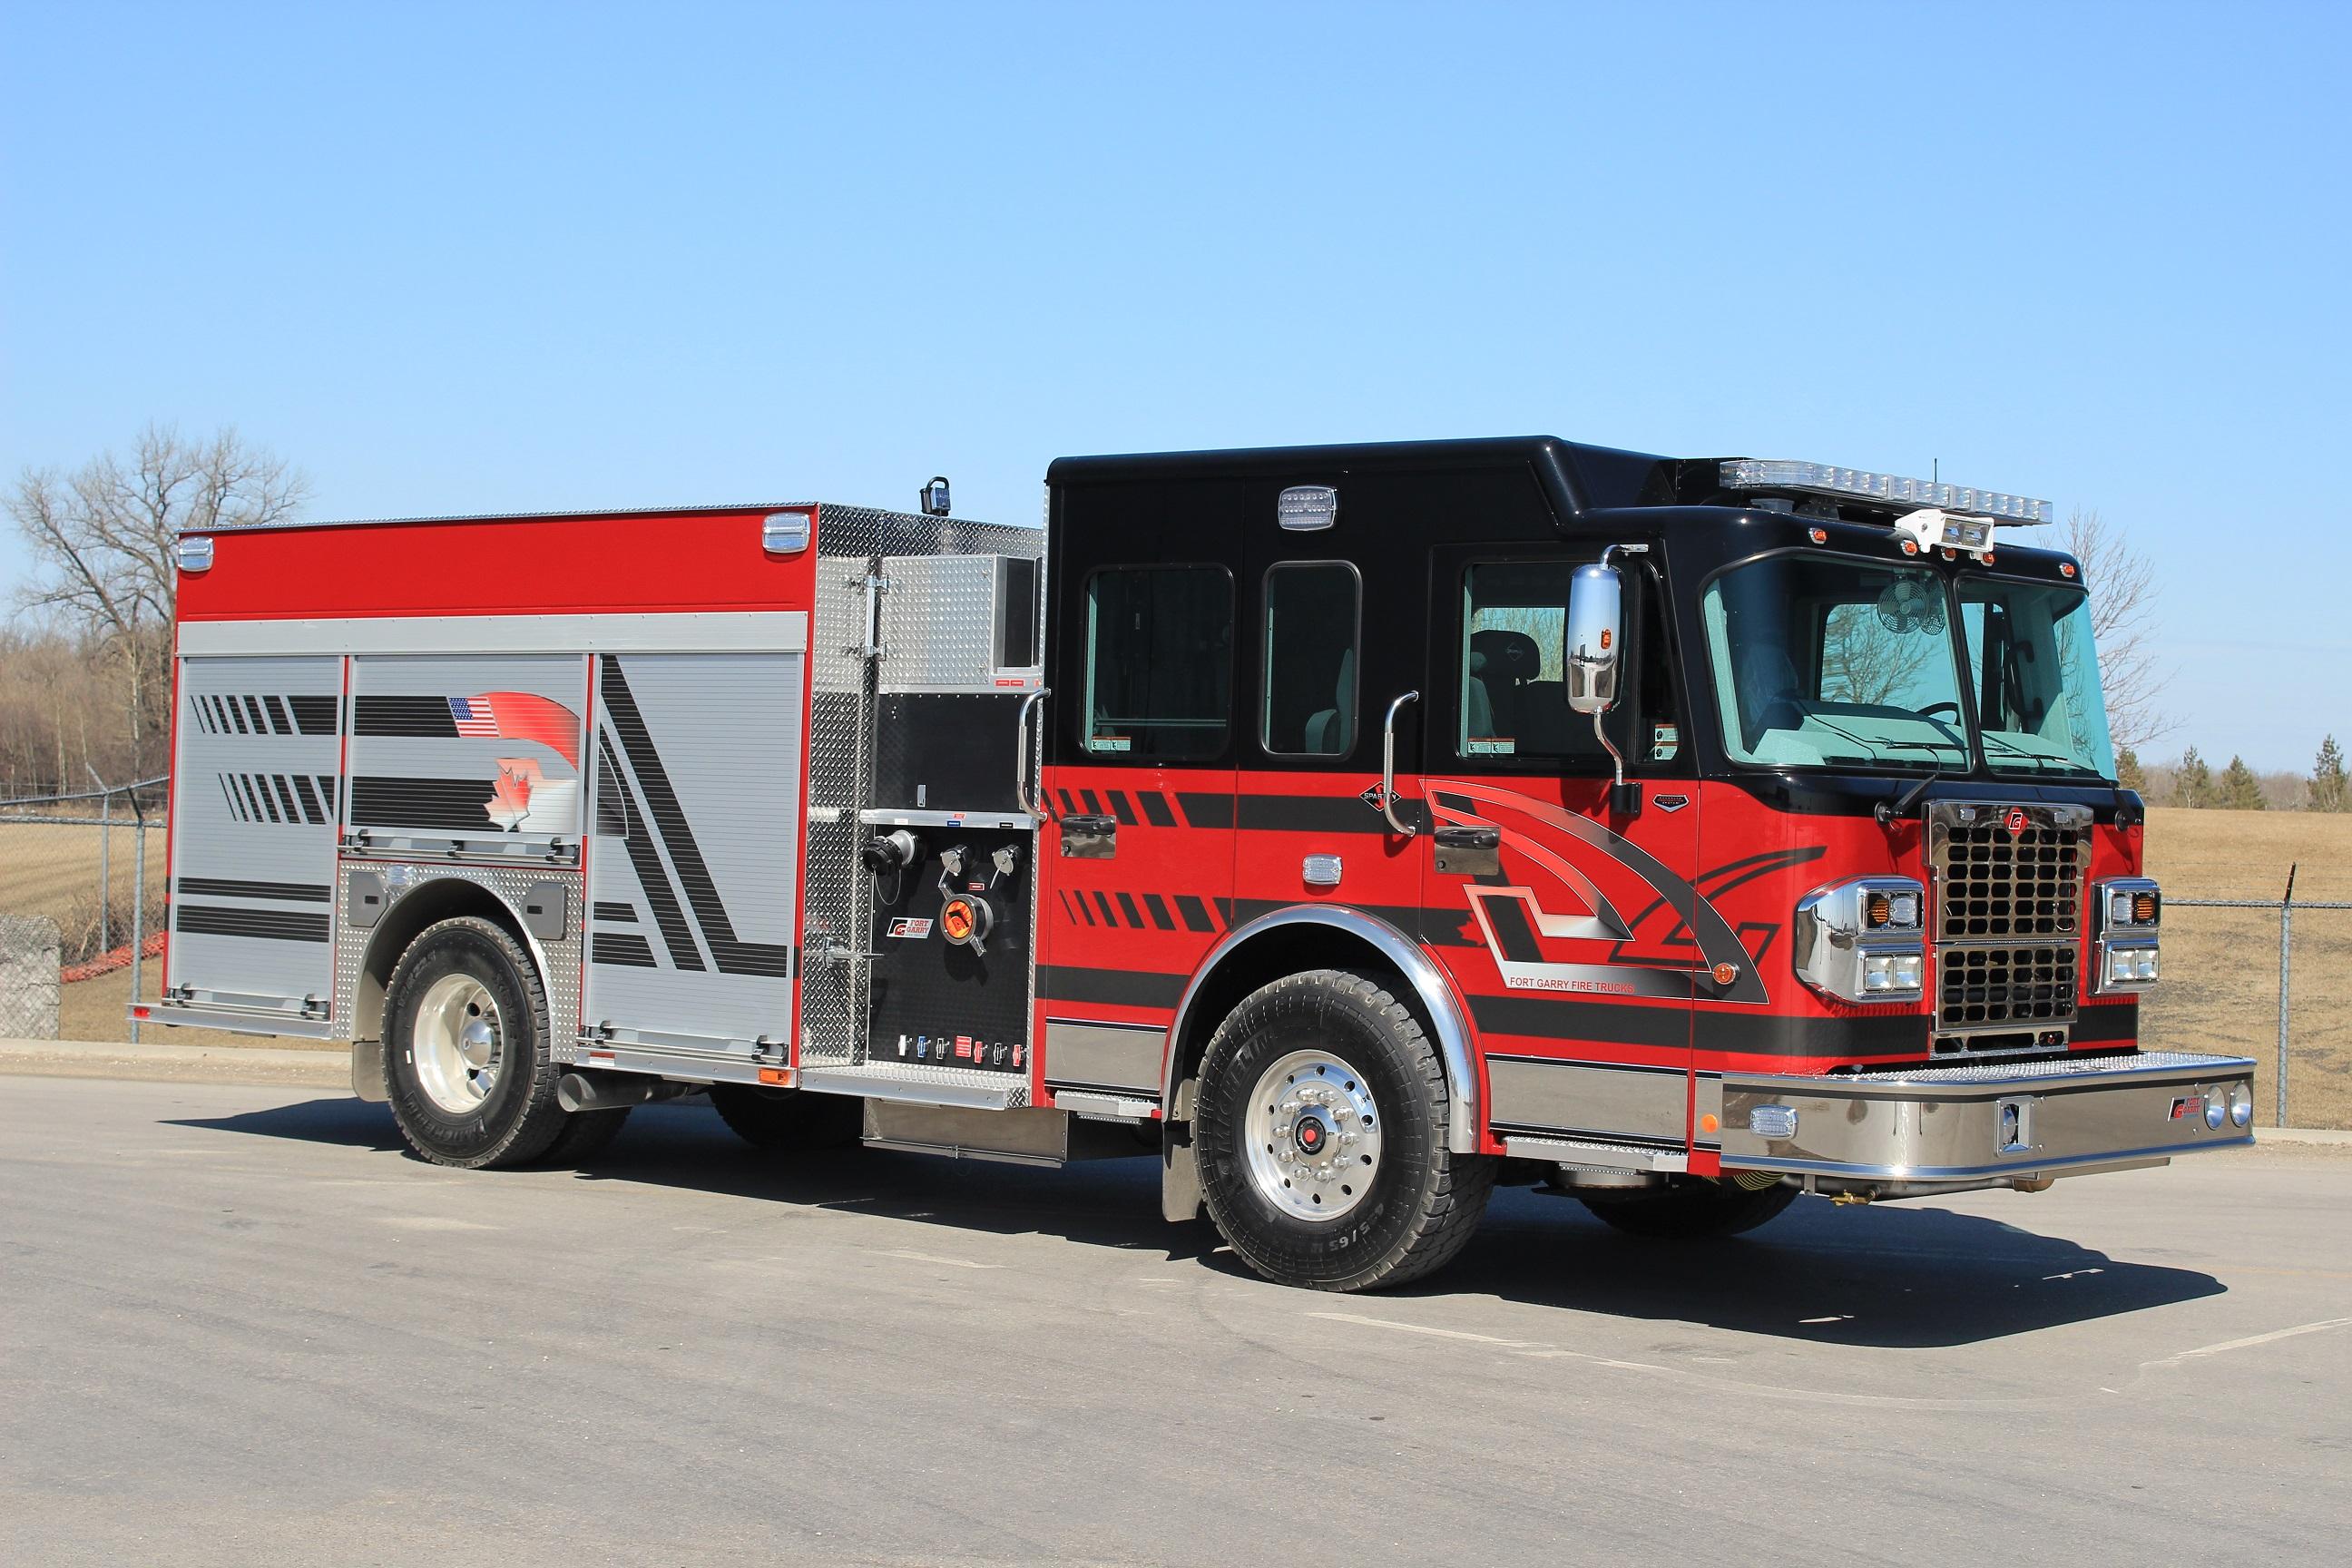 Standard Models | Fort Garry Fire Trucks - Fire & Rescue